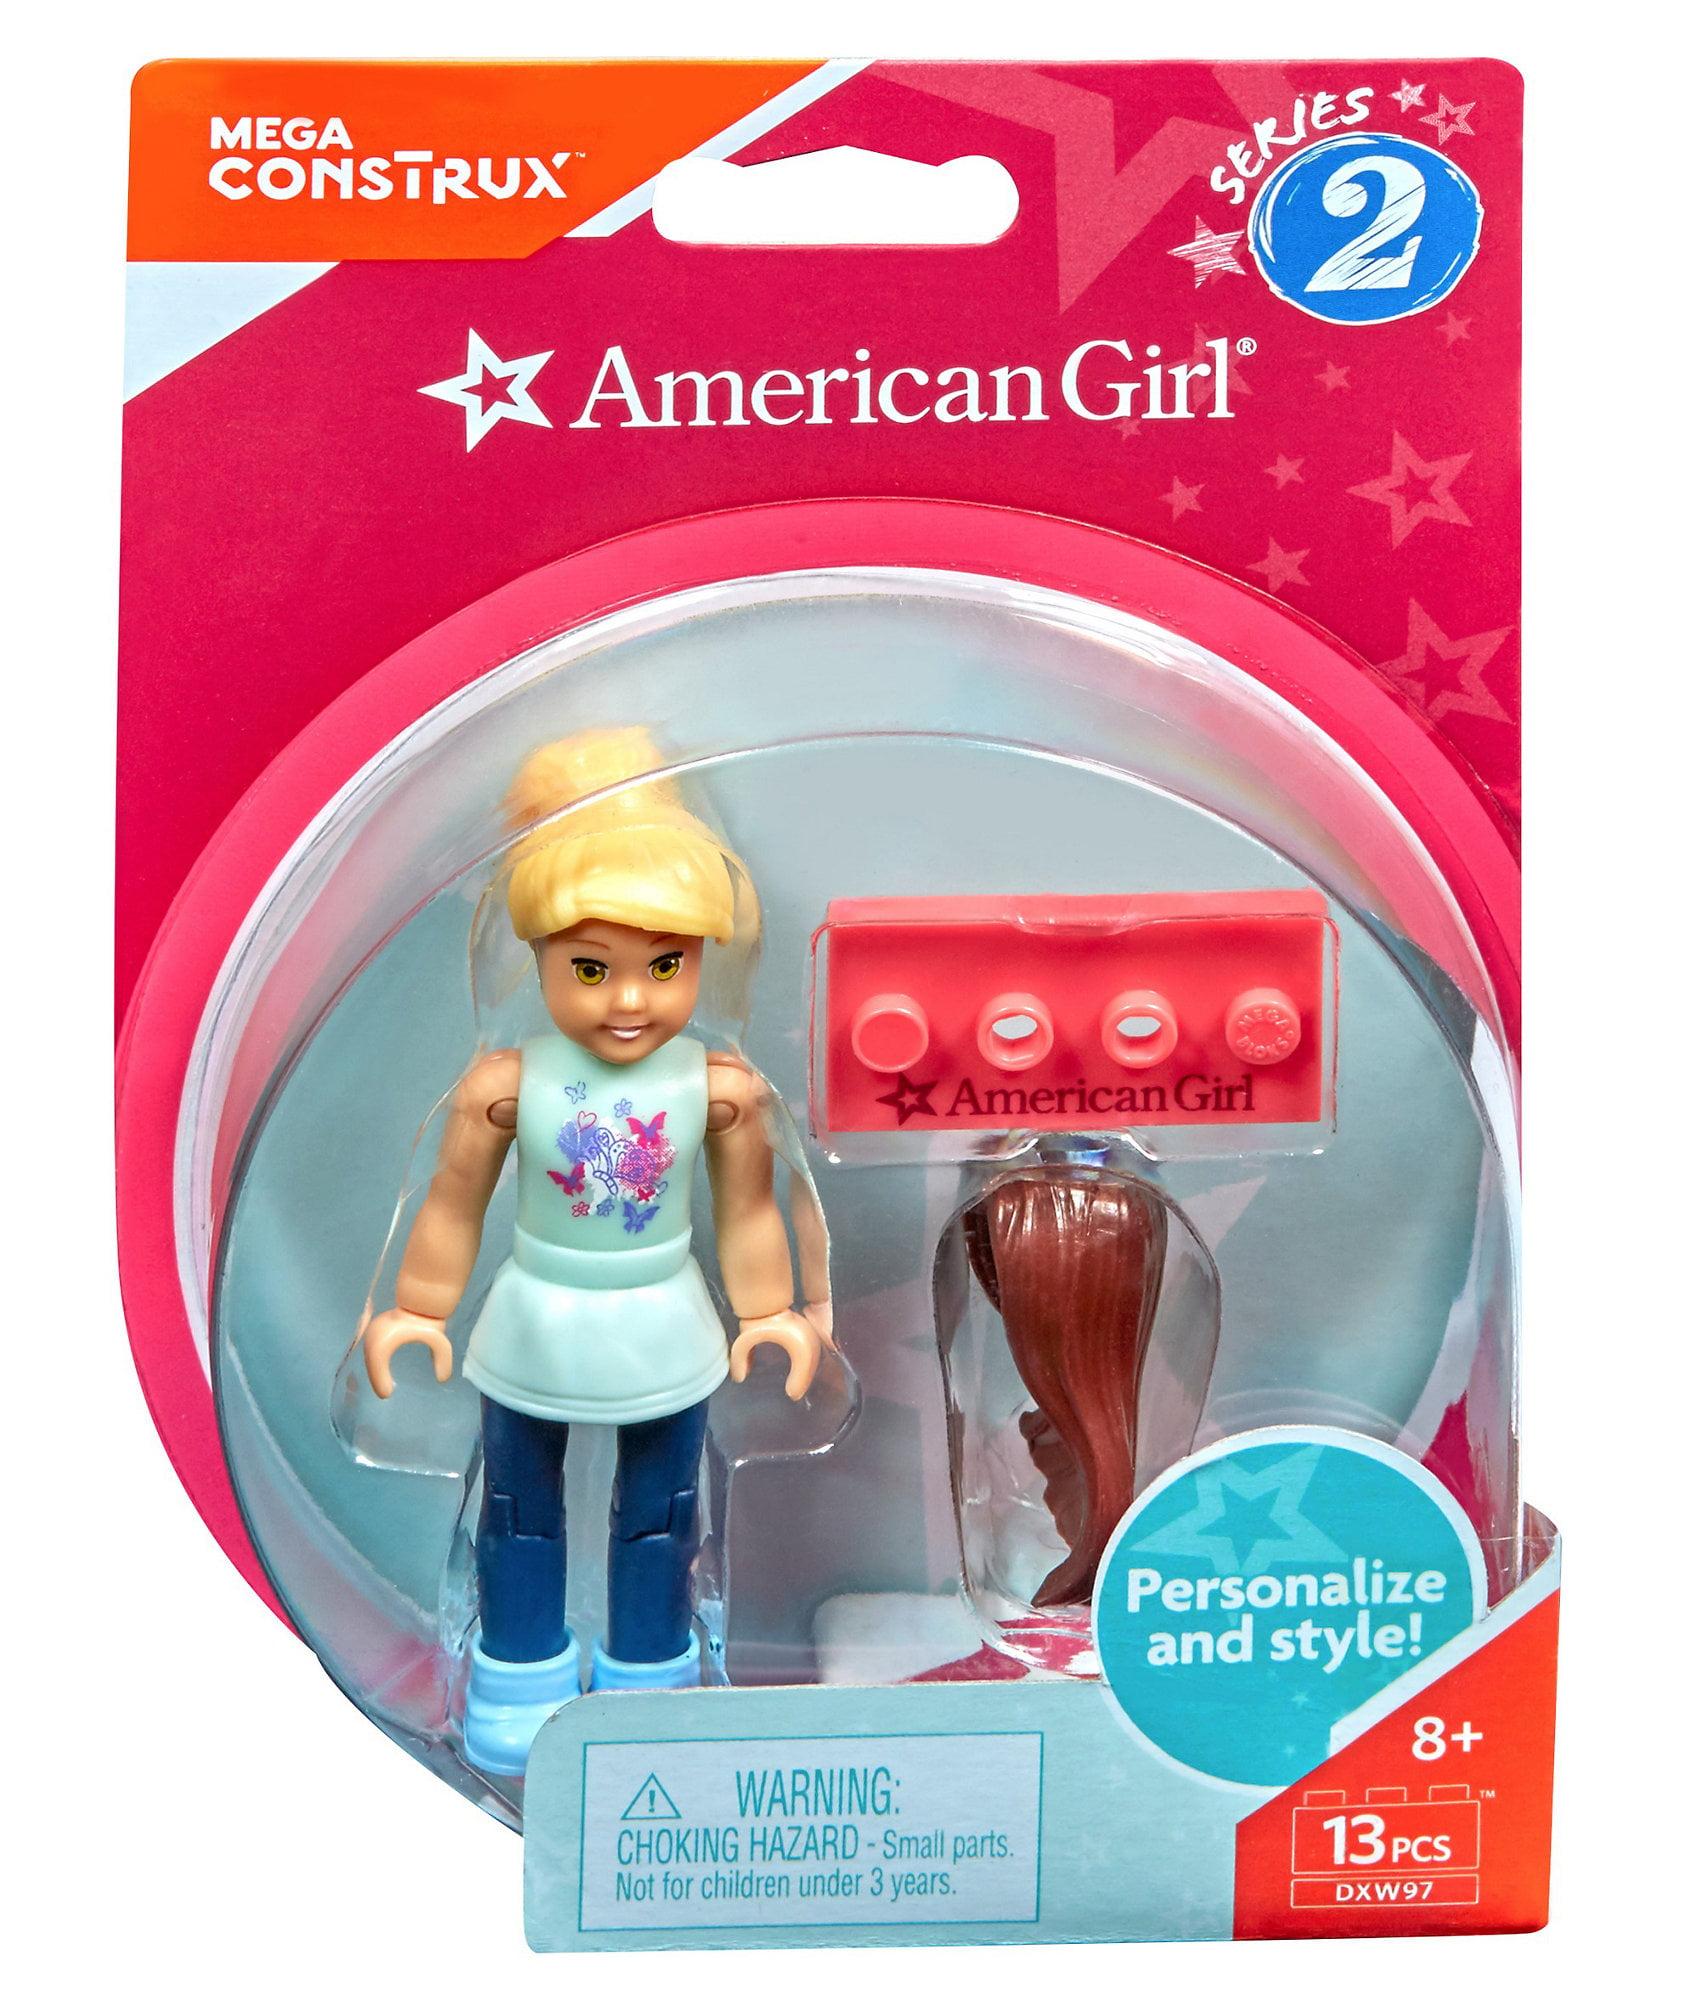 Mega Construx American Girl Blossom Burst Outfit by MATTEL INC.